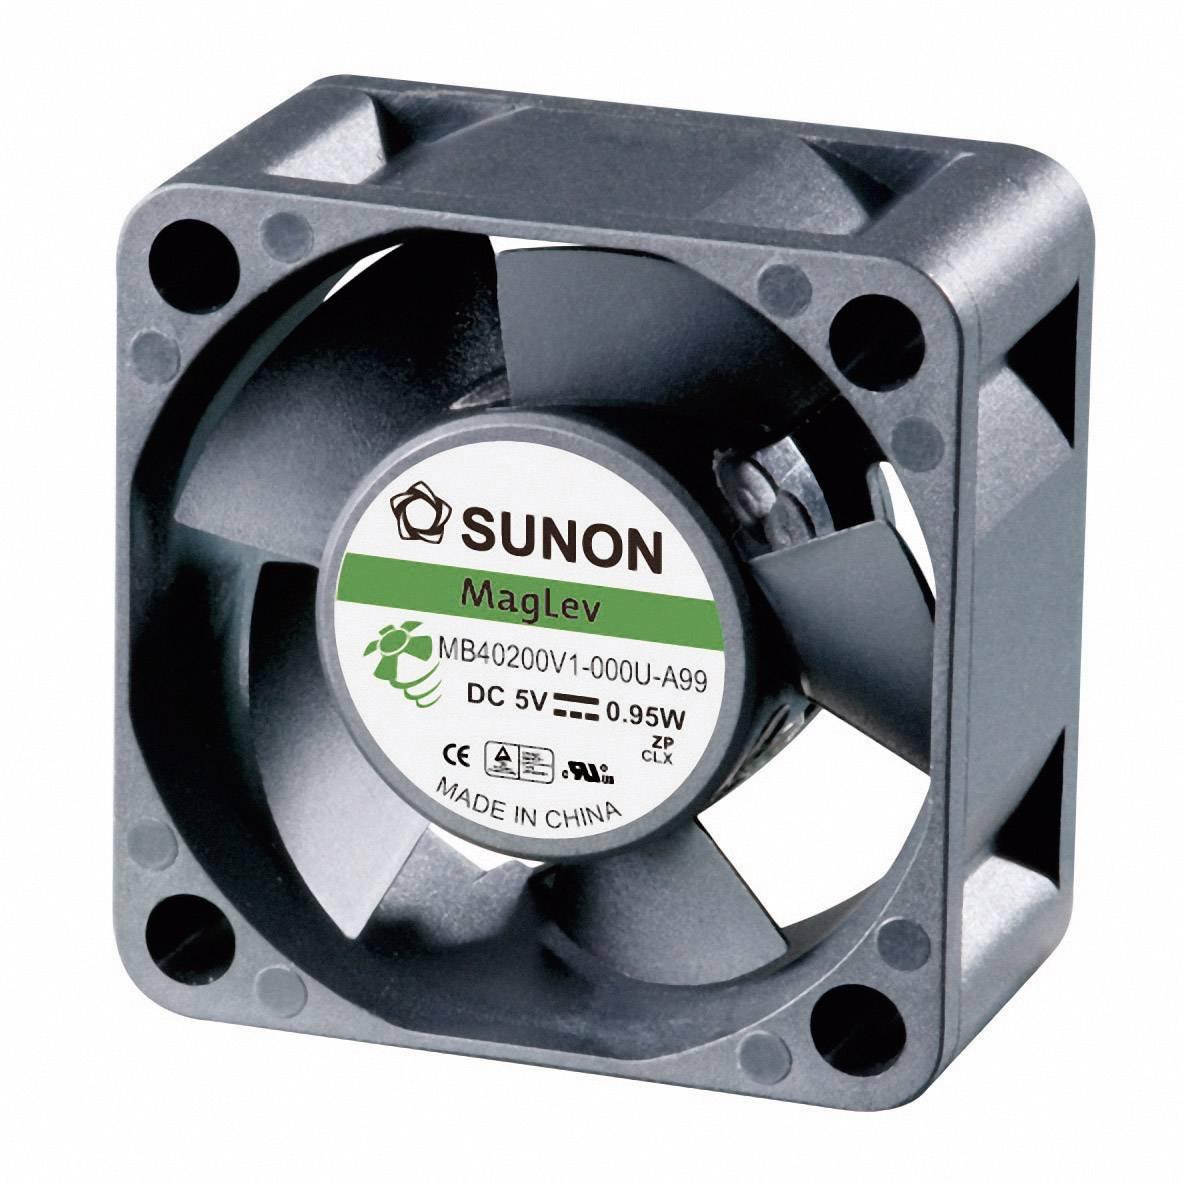 Ventilátor Sunon DR MB40200V2-0000-A99, 40 x 40 x 20 mm, 5 V/DC